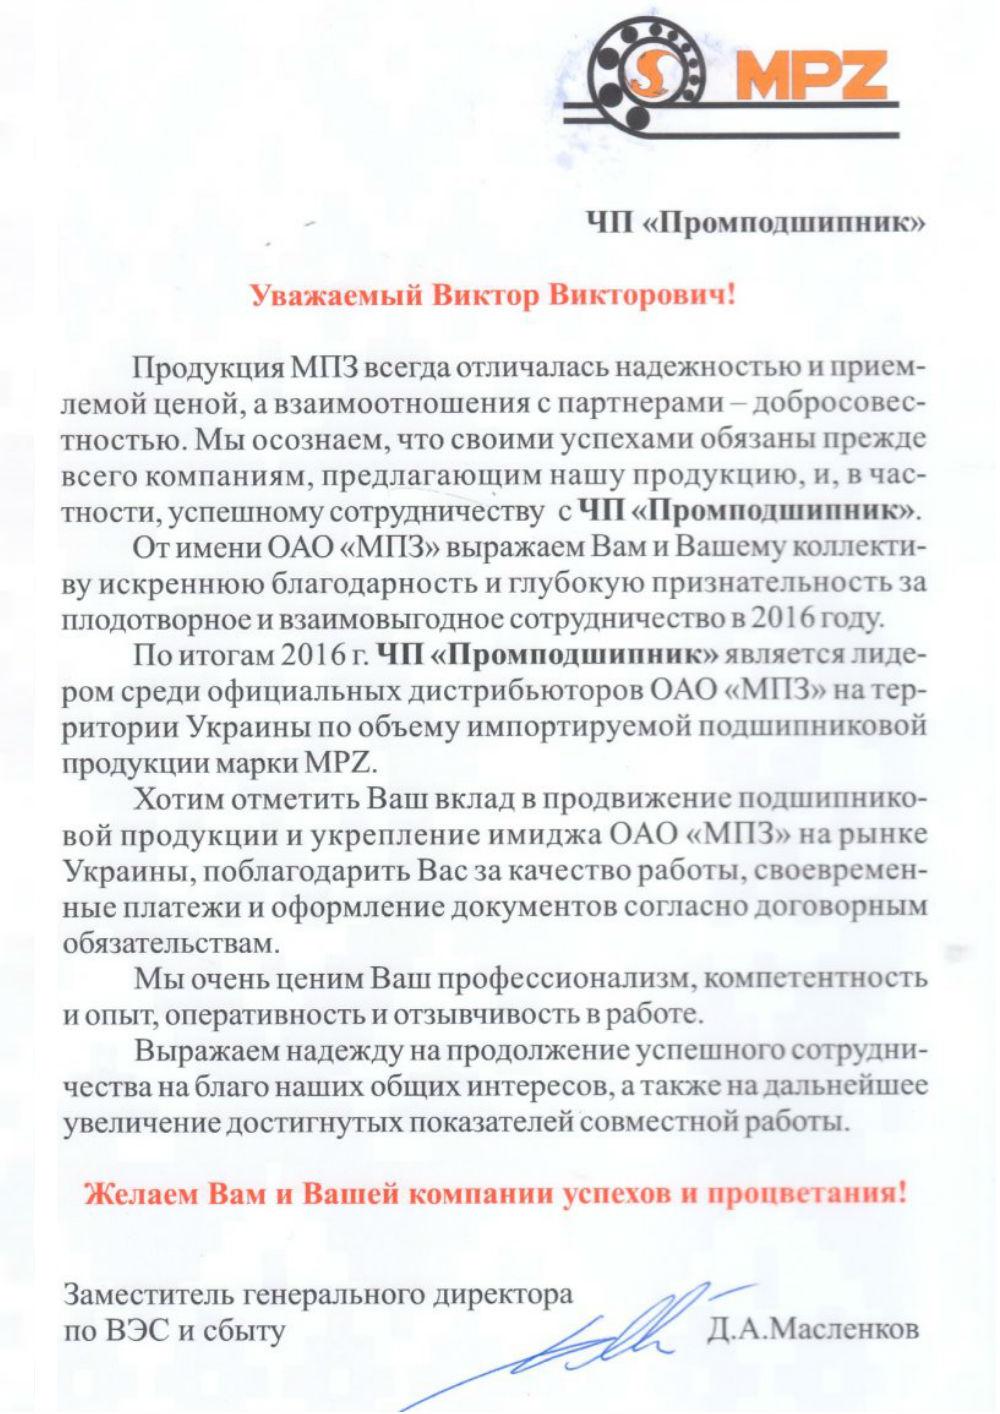 ЧП Промподшипник лучший дистрибьютор ОАО МПЗ